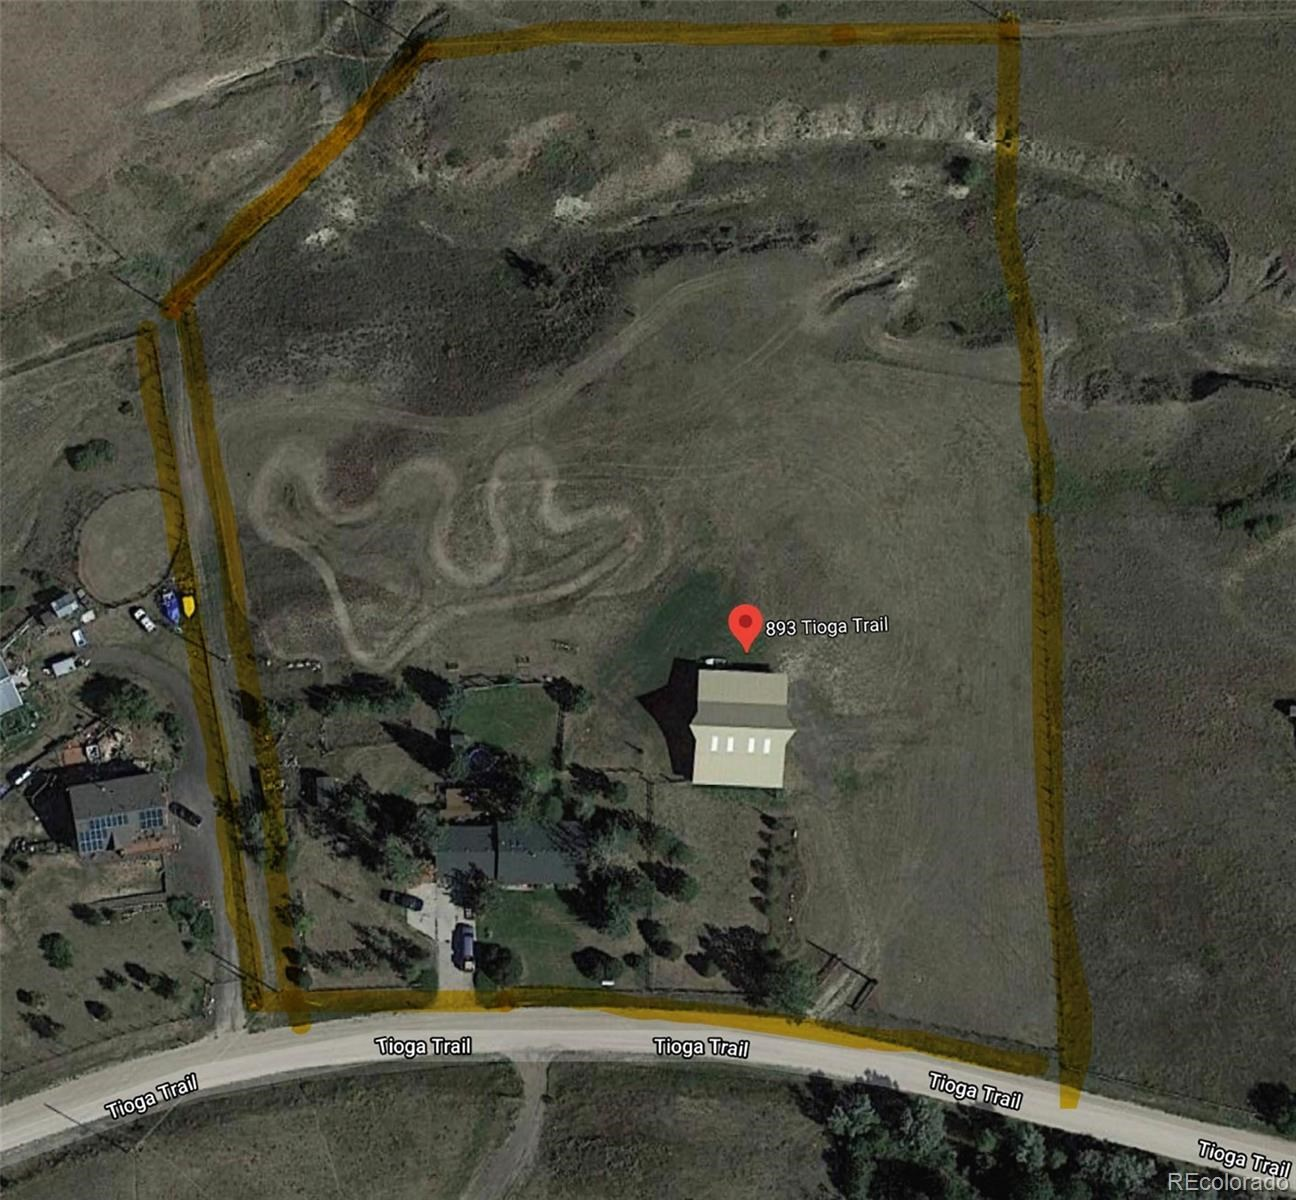 MLS# 9978460 - 31 - 893 Tioga Trail, Parker, CO 80138